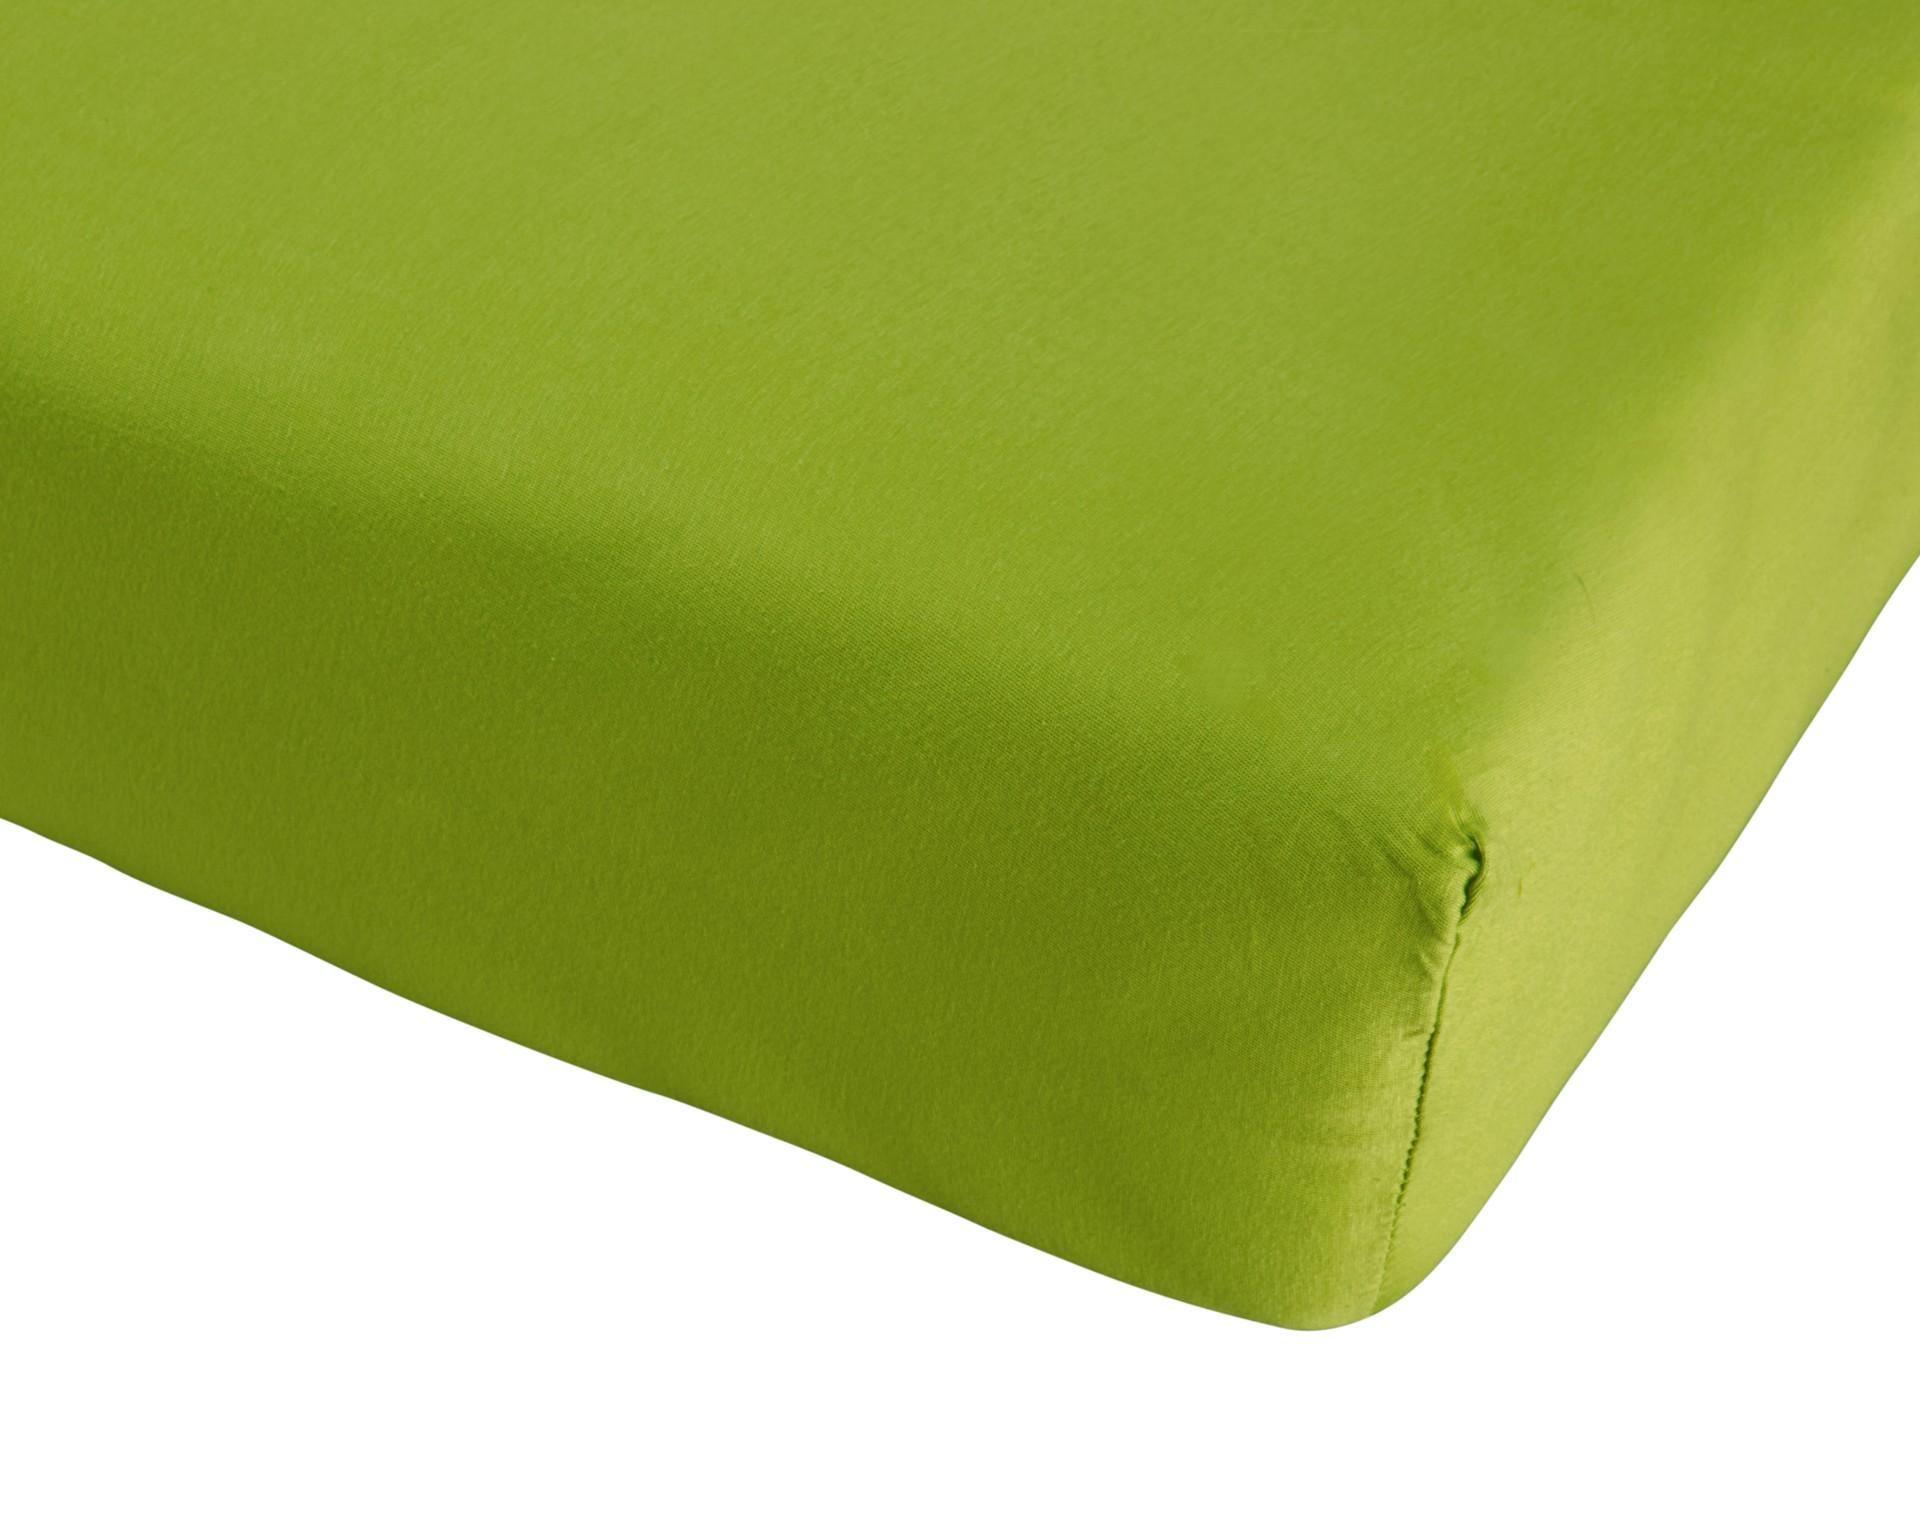 Jersey-Spannbettlaken (180x200, grün)